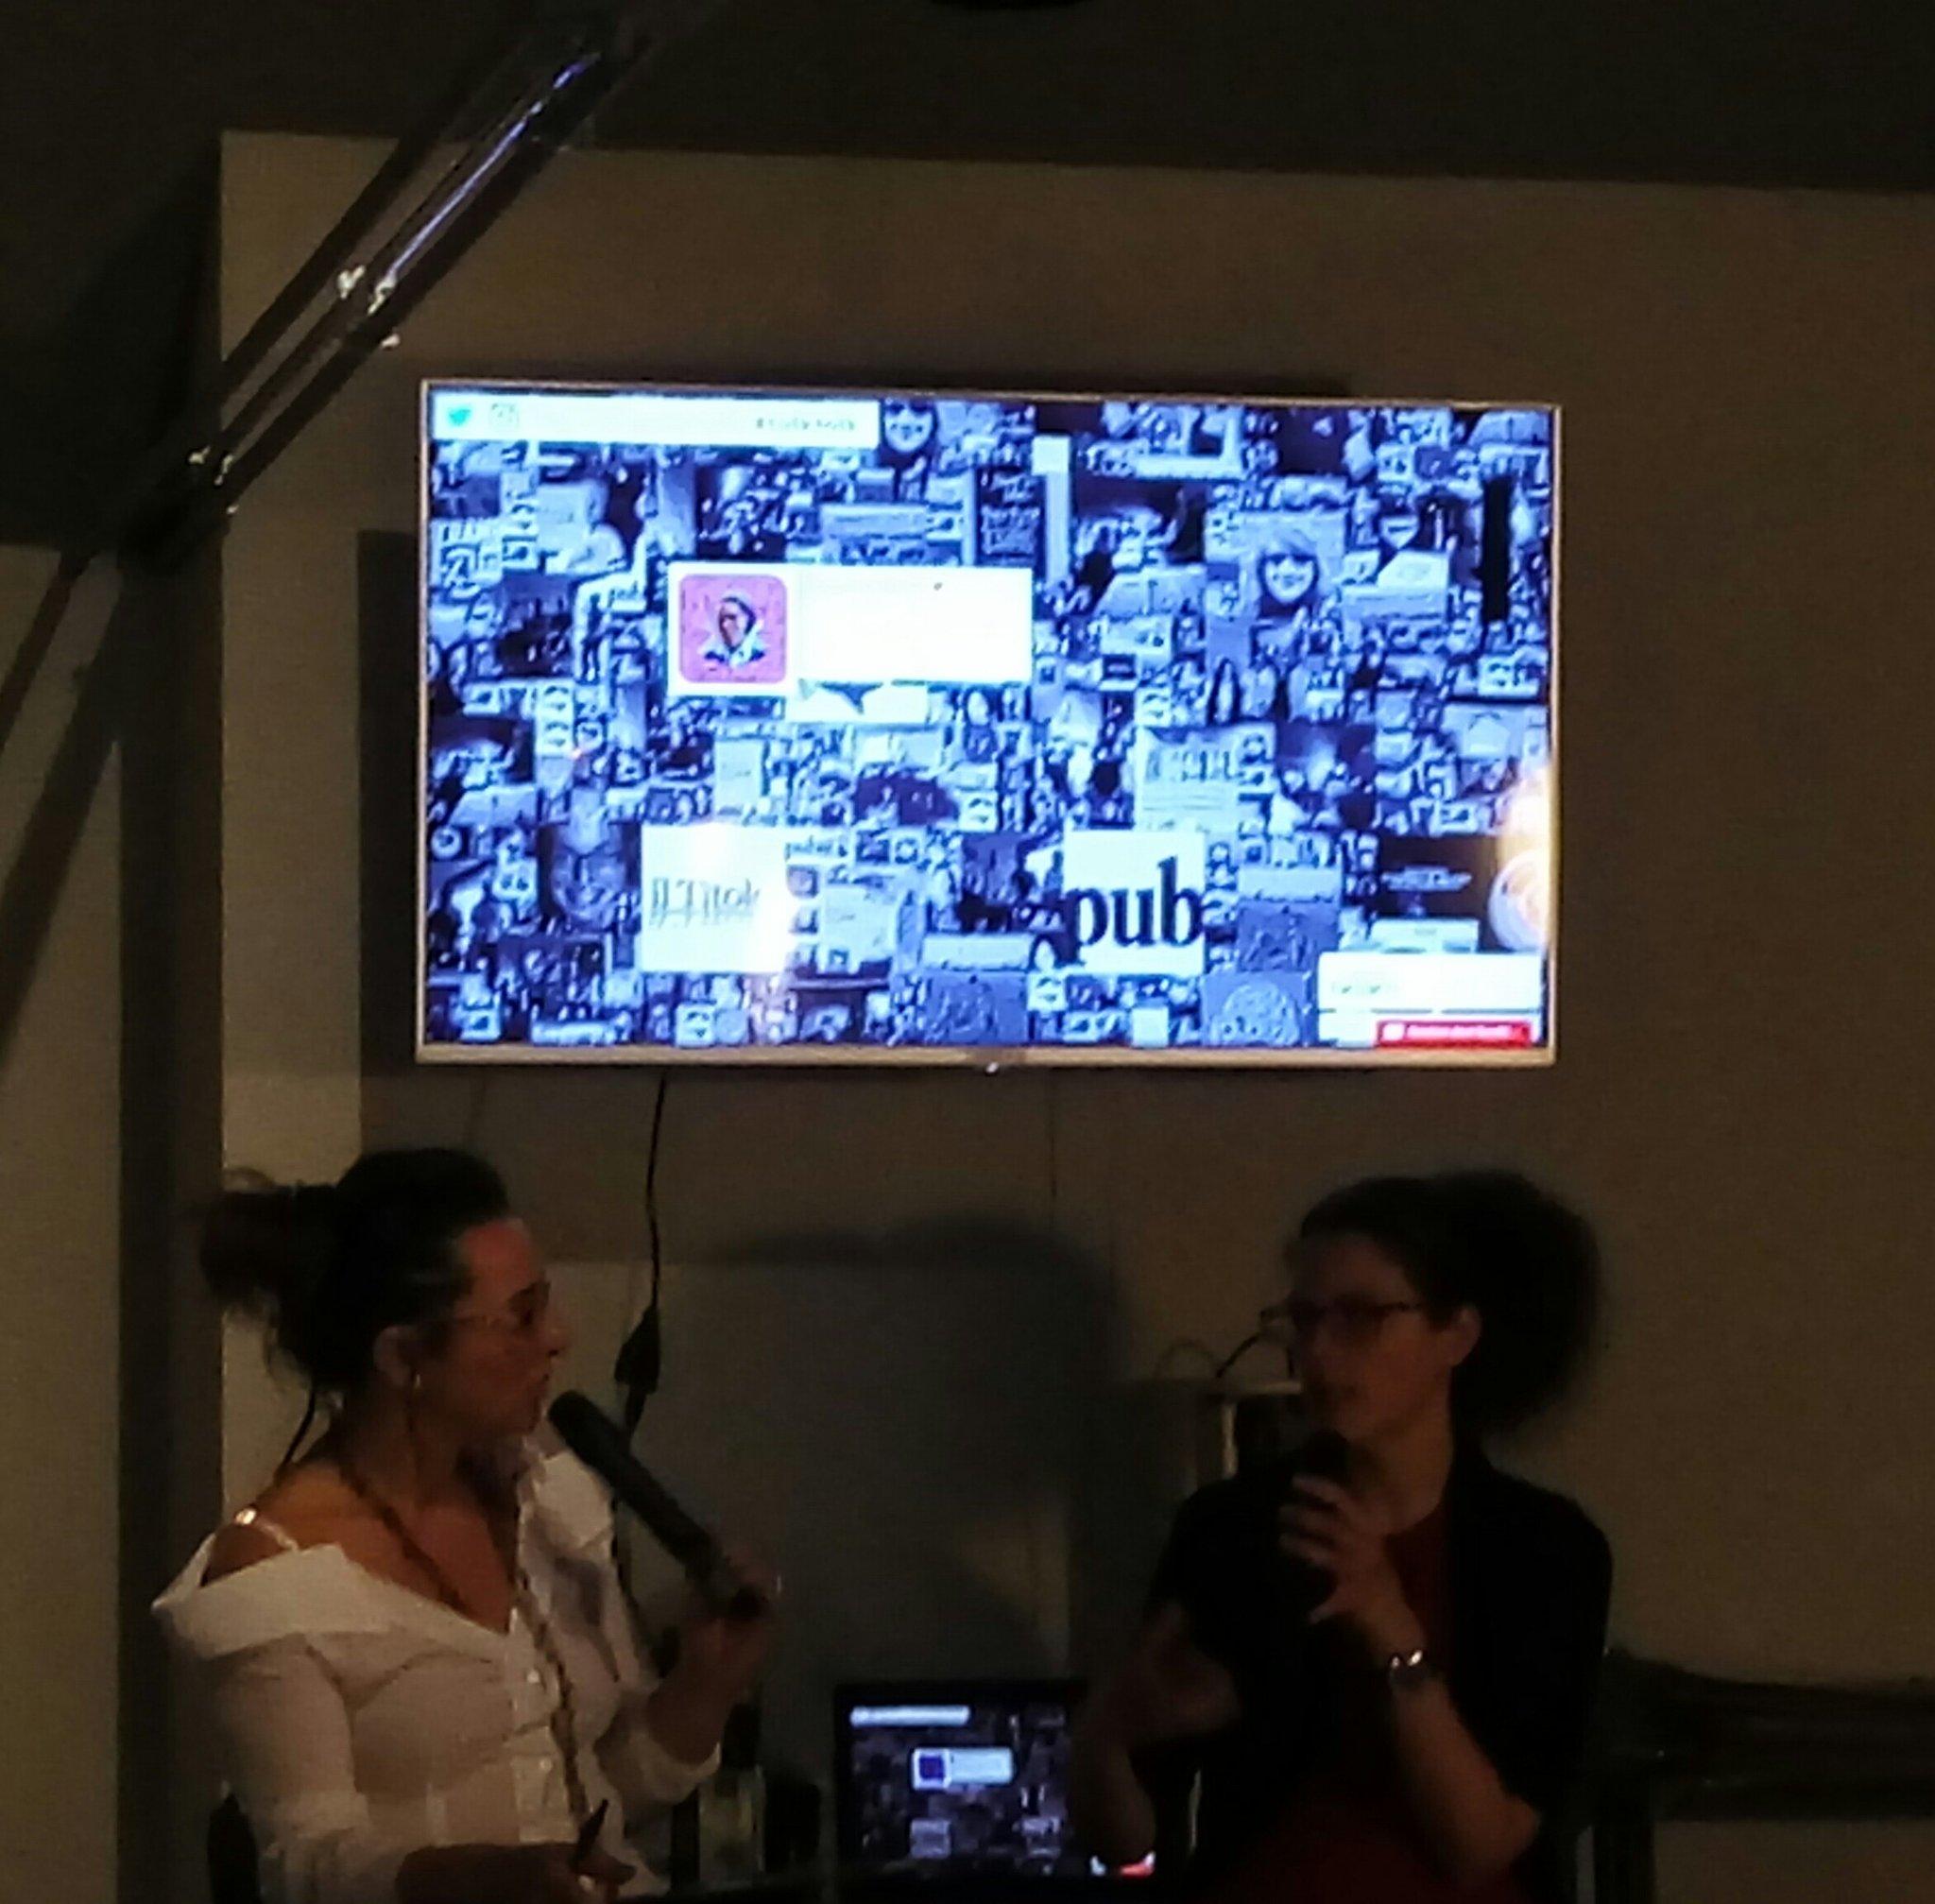 oggi a #tolktolk si parla di #snapchat. modalita #videoverticali: on 😎 @ramosvrnc https://t.co/UOSUYdiAPB